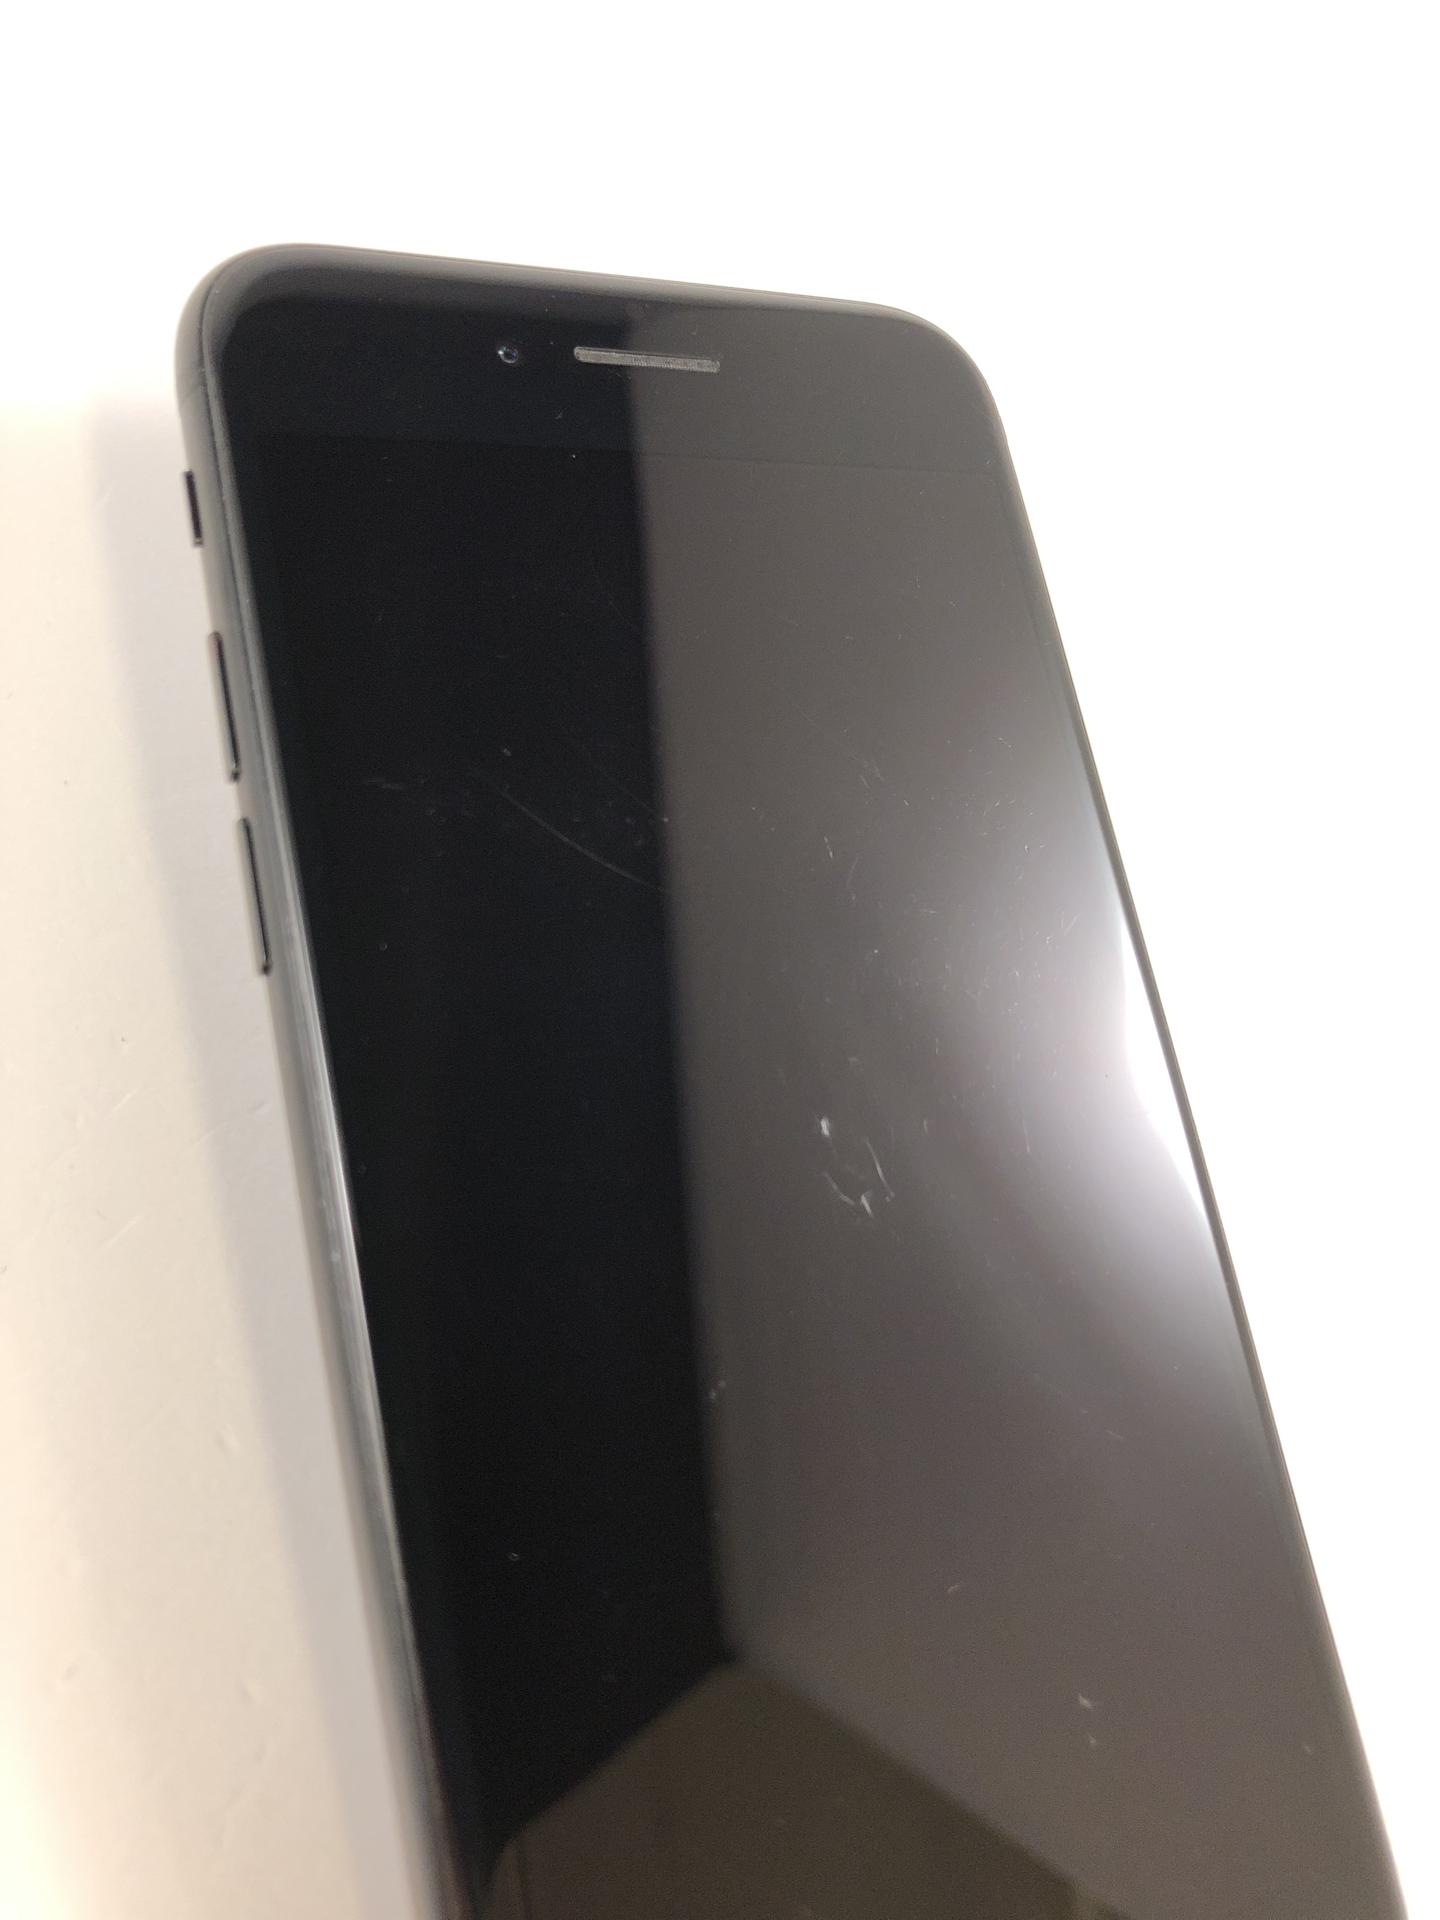 iPhone 7 32GB, 32GB, Black, bild 3